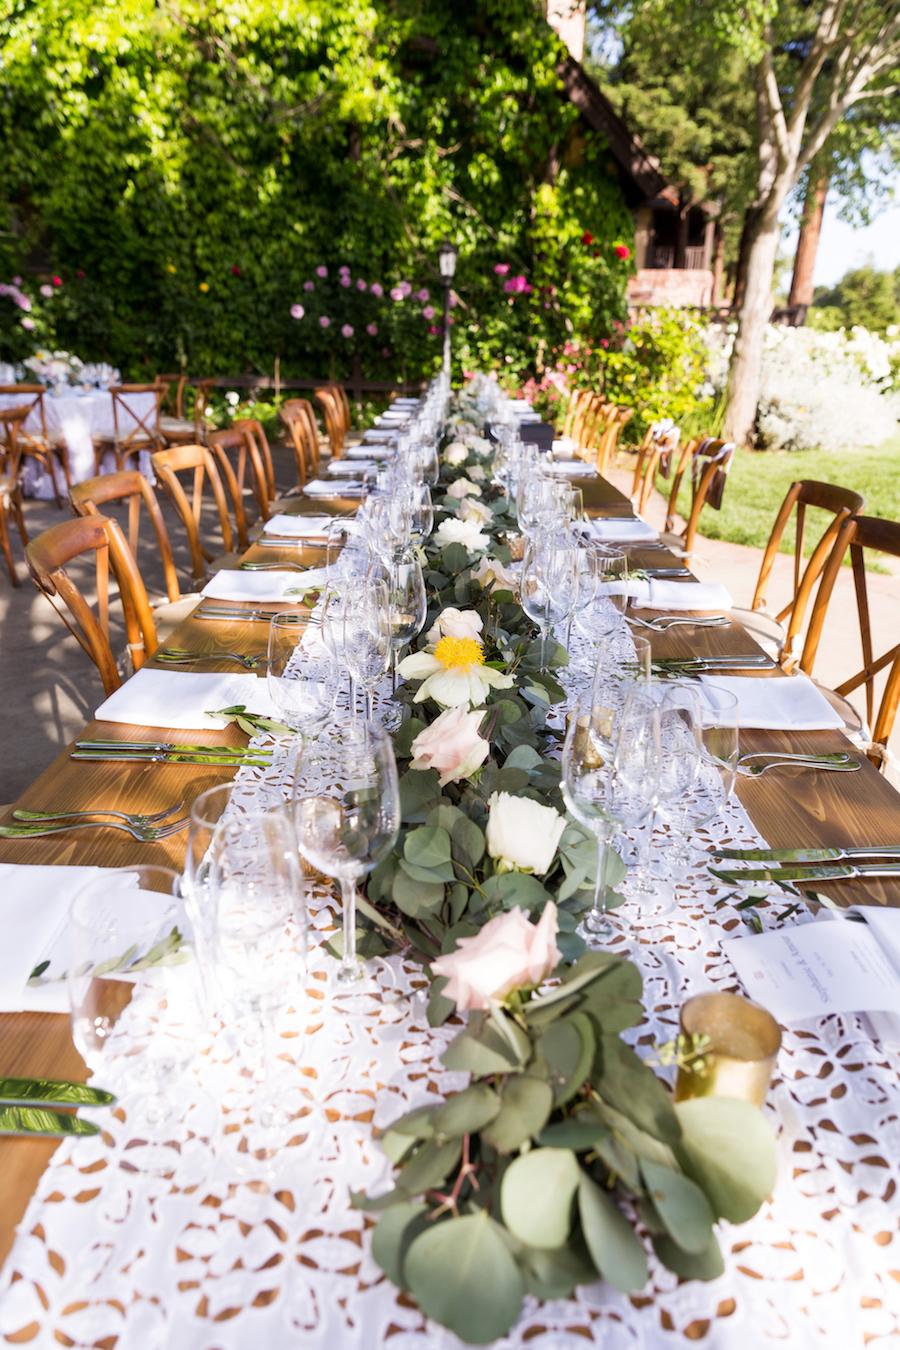 Chic and Organic Outdoor Wedding at Harvest Inn111.jpg